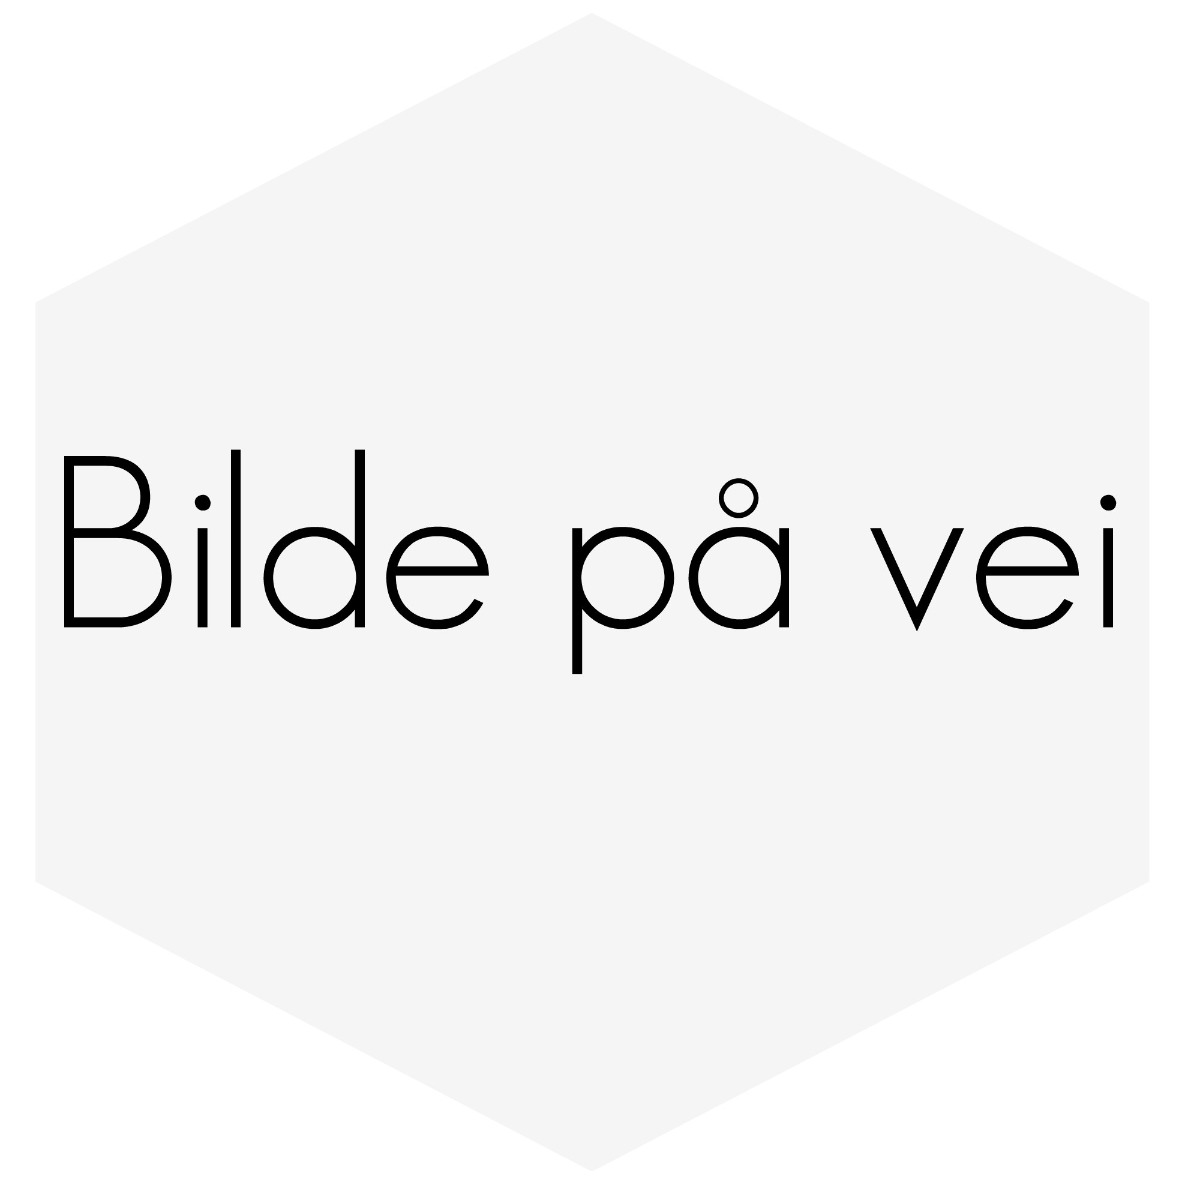 VOLVO S60/V60/V70 2.0T/T5 2010-2013 TRYKKSLANGER RØD